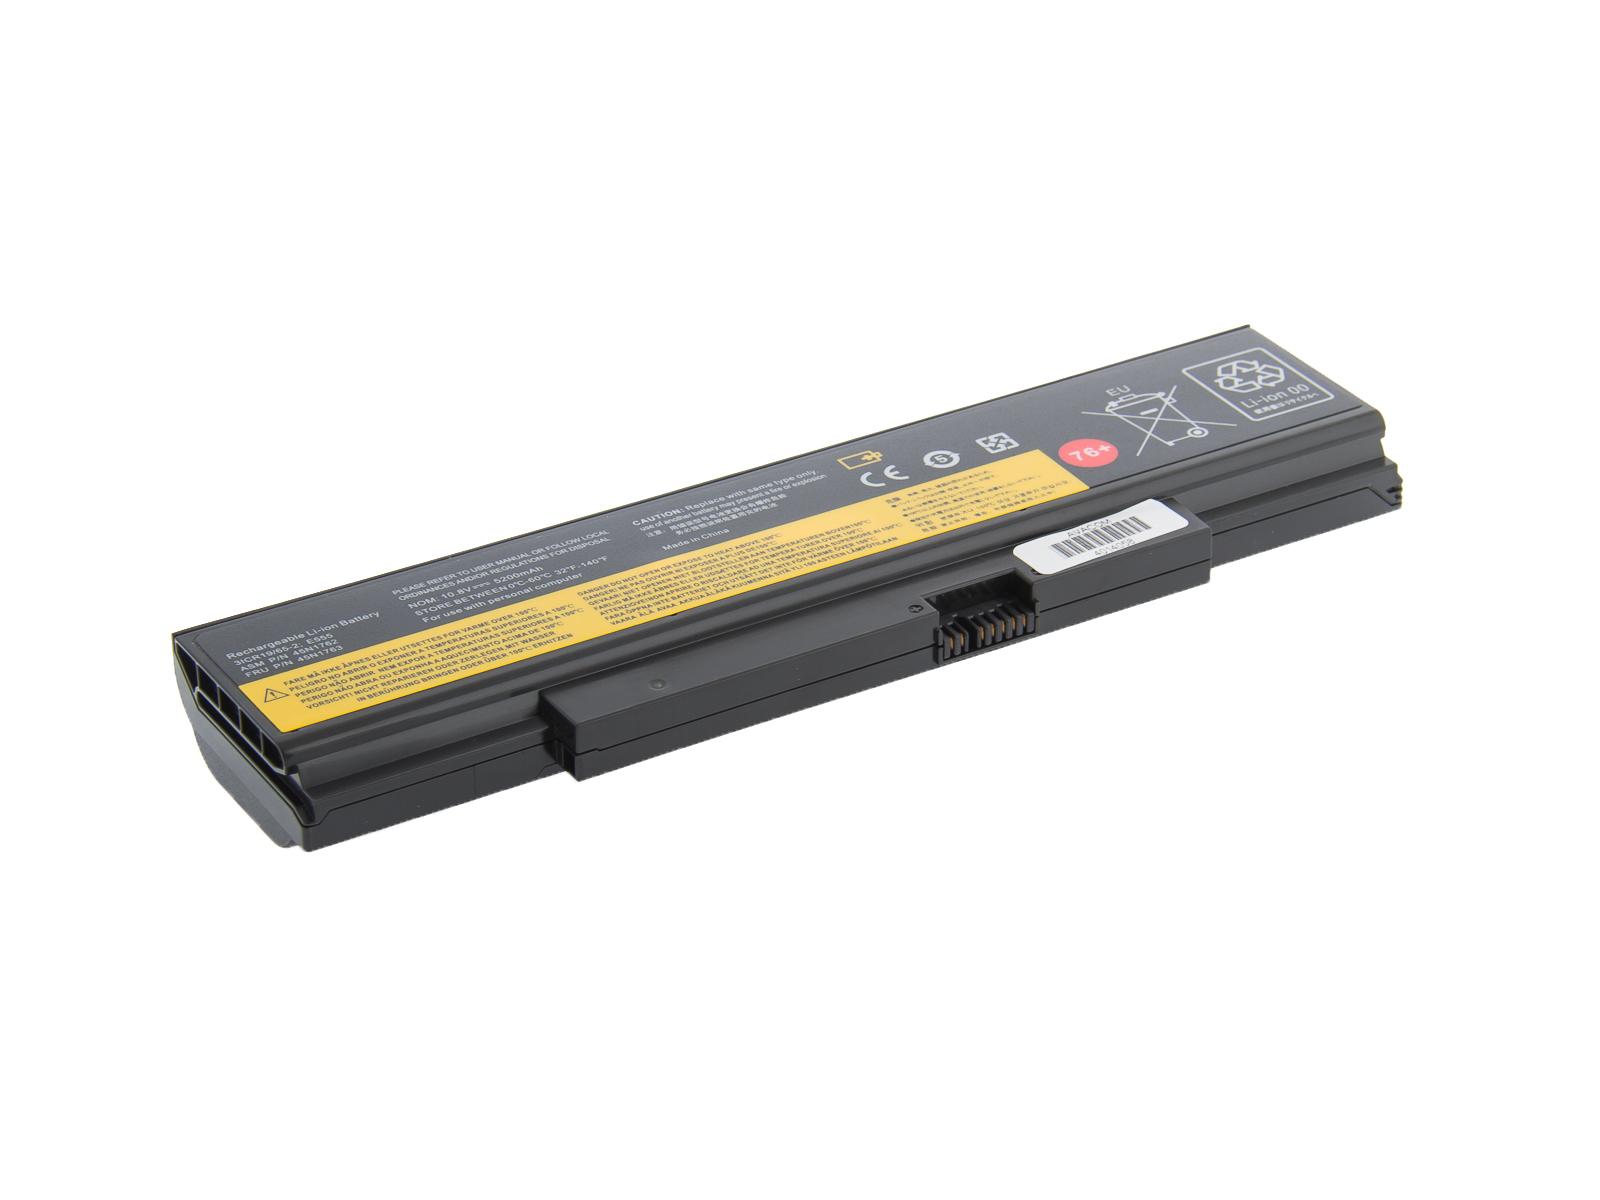 Baterie AVACOM NOLE-E550-S26 pro Lenovo ThinkPad E550 76+ Li-Ion 10,8V 5200mAh 56Wh